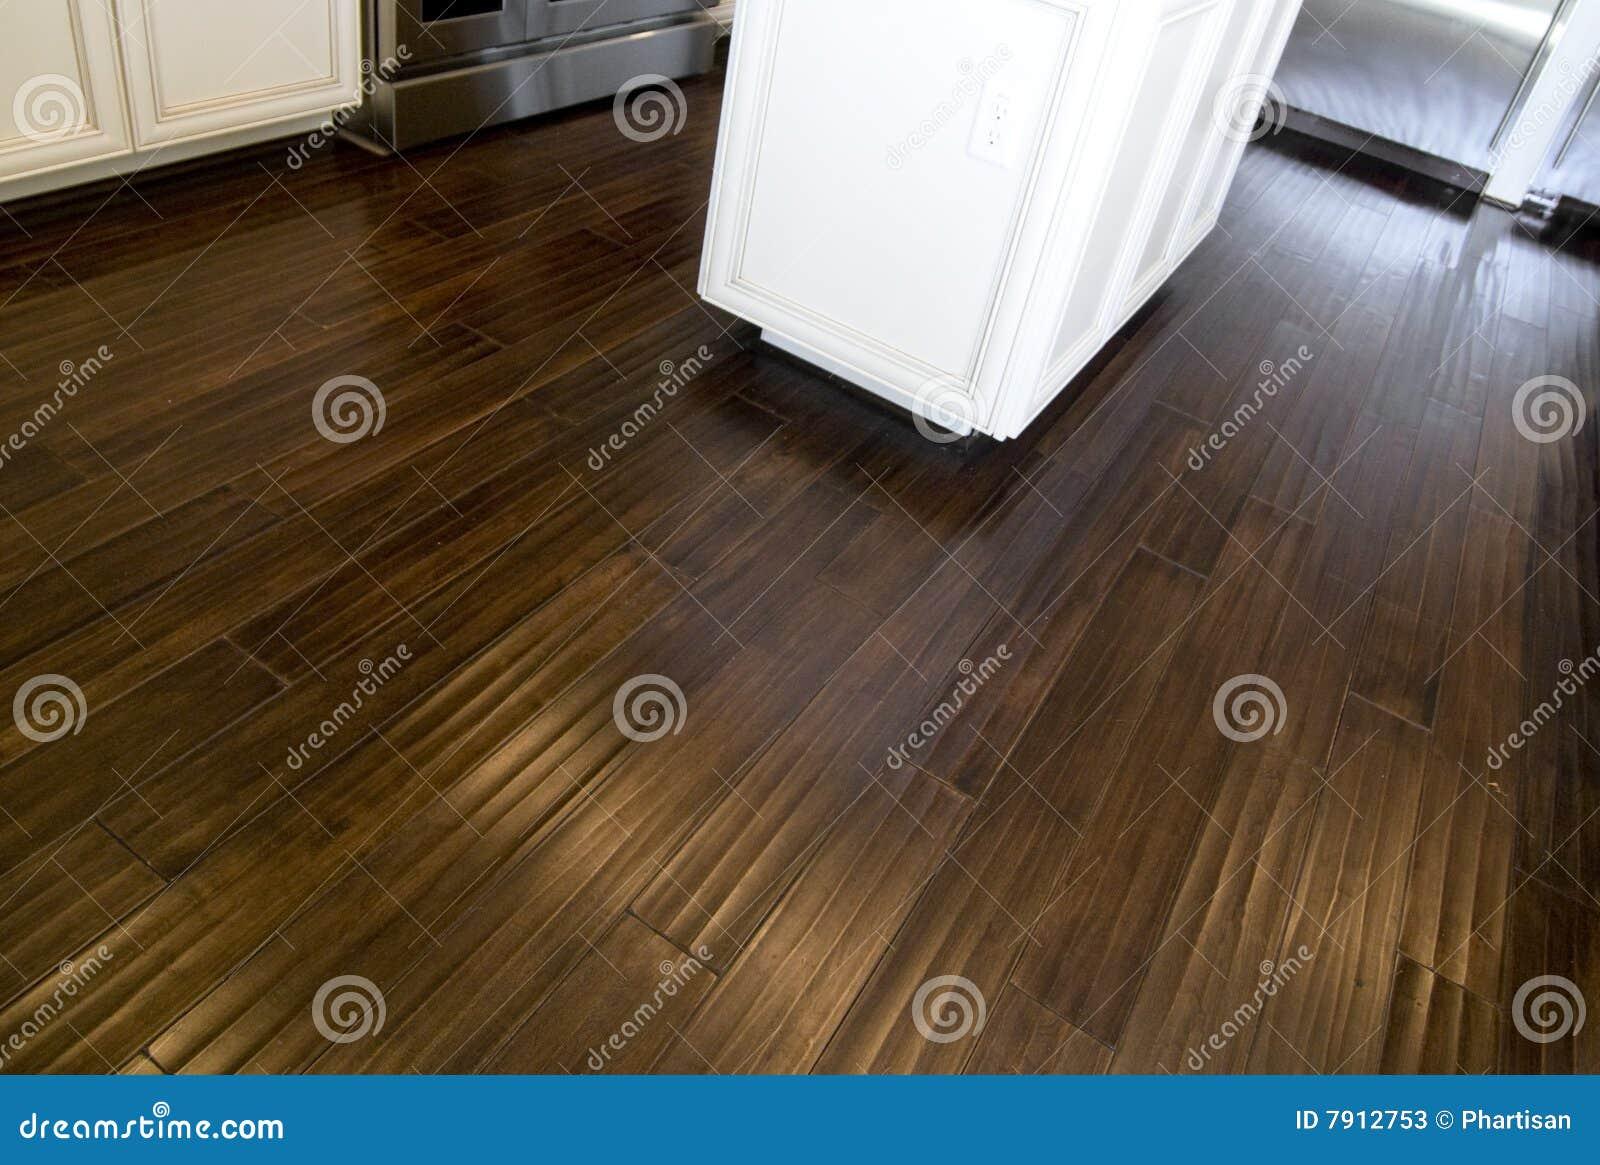 Dark stained hardwood flooring